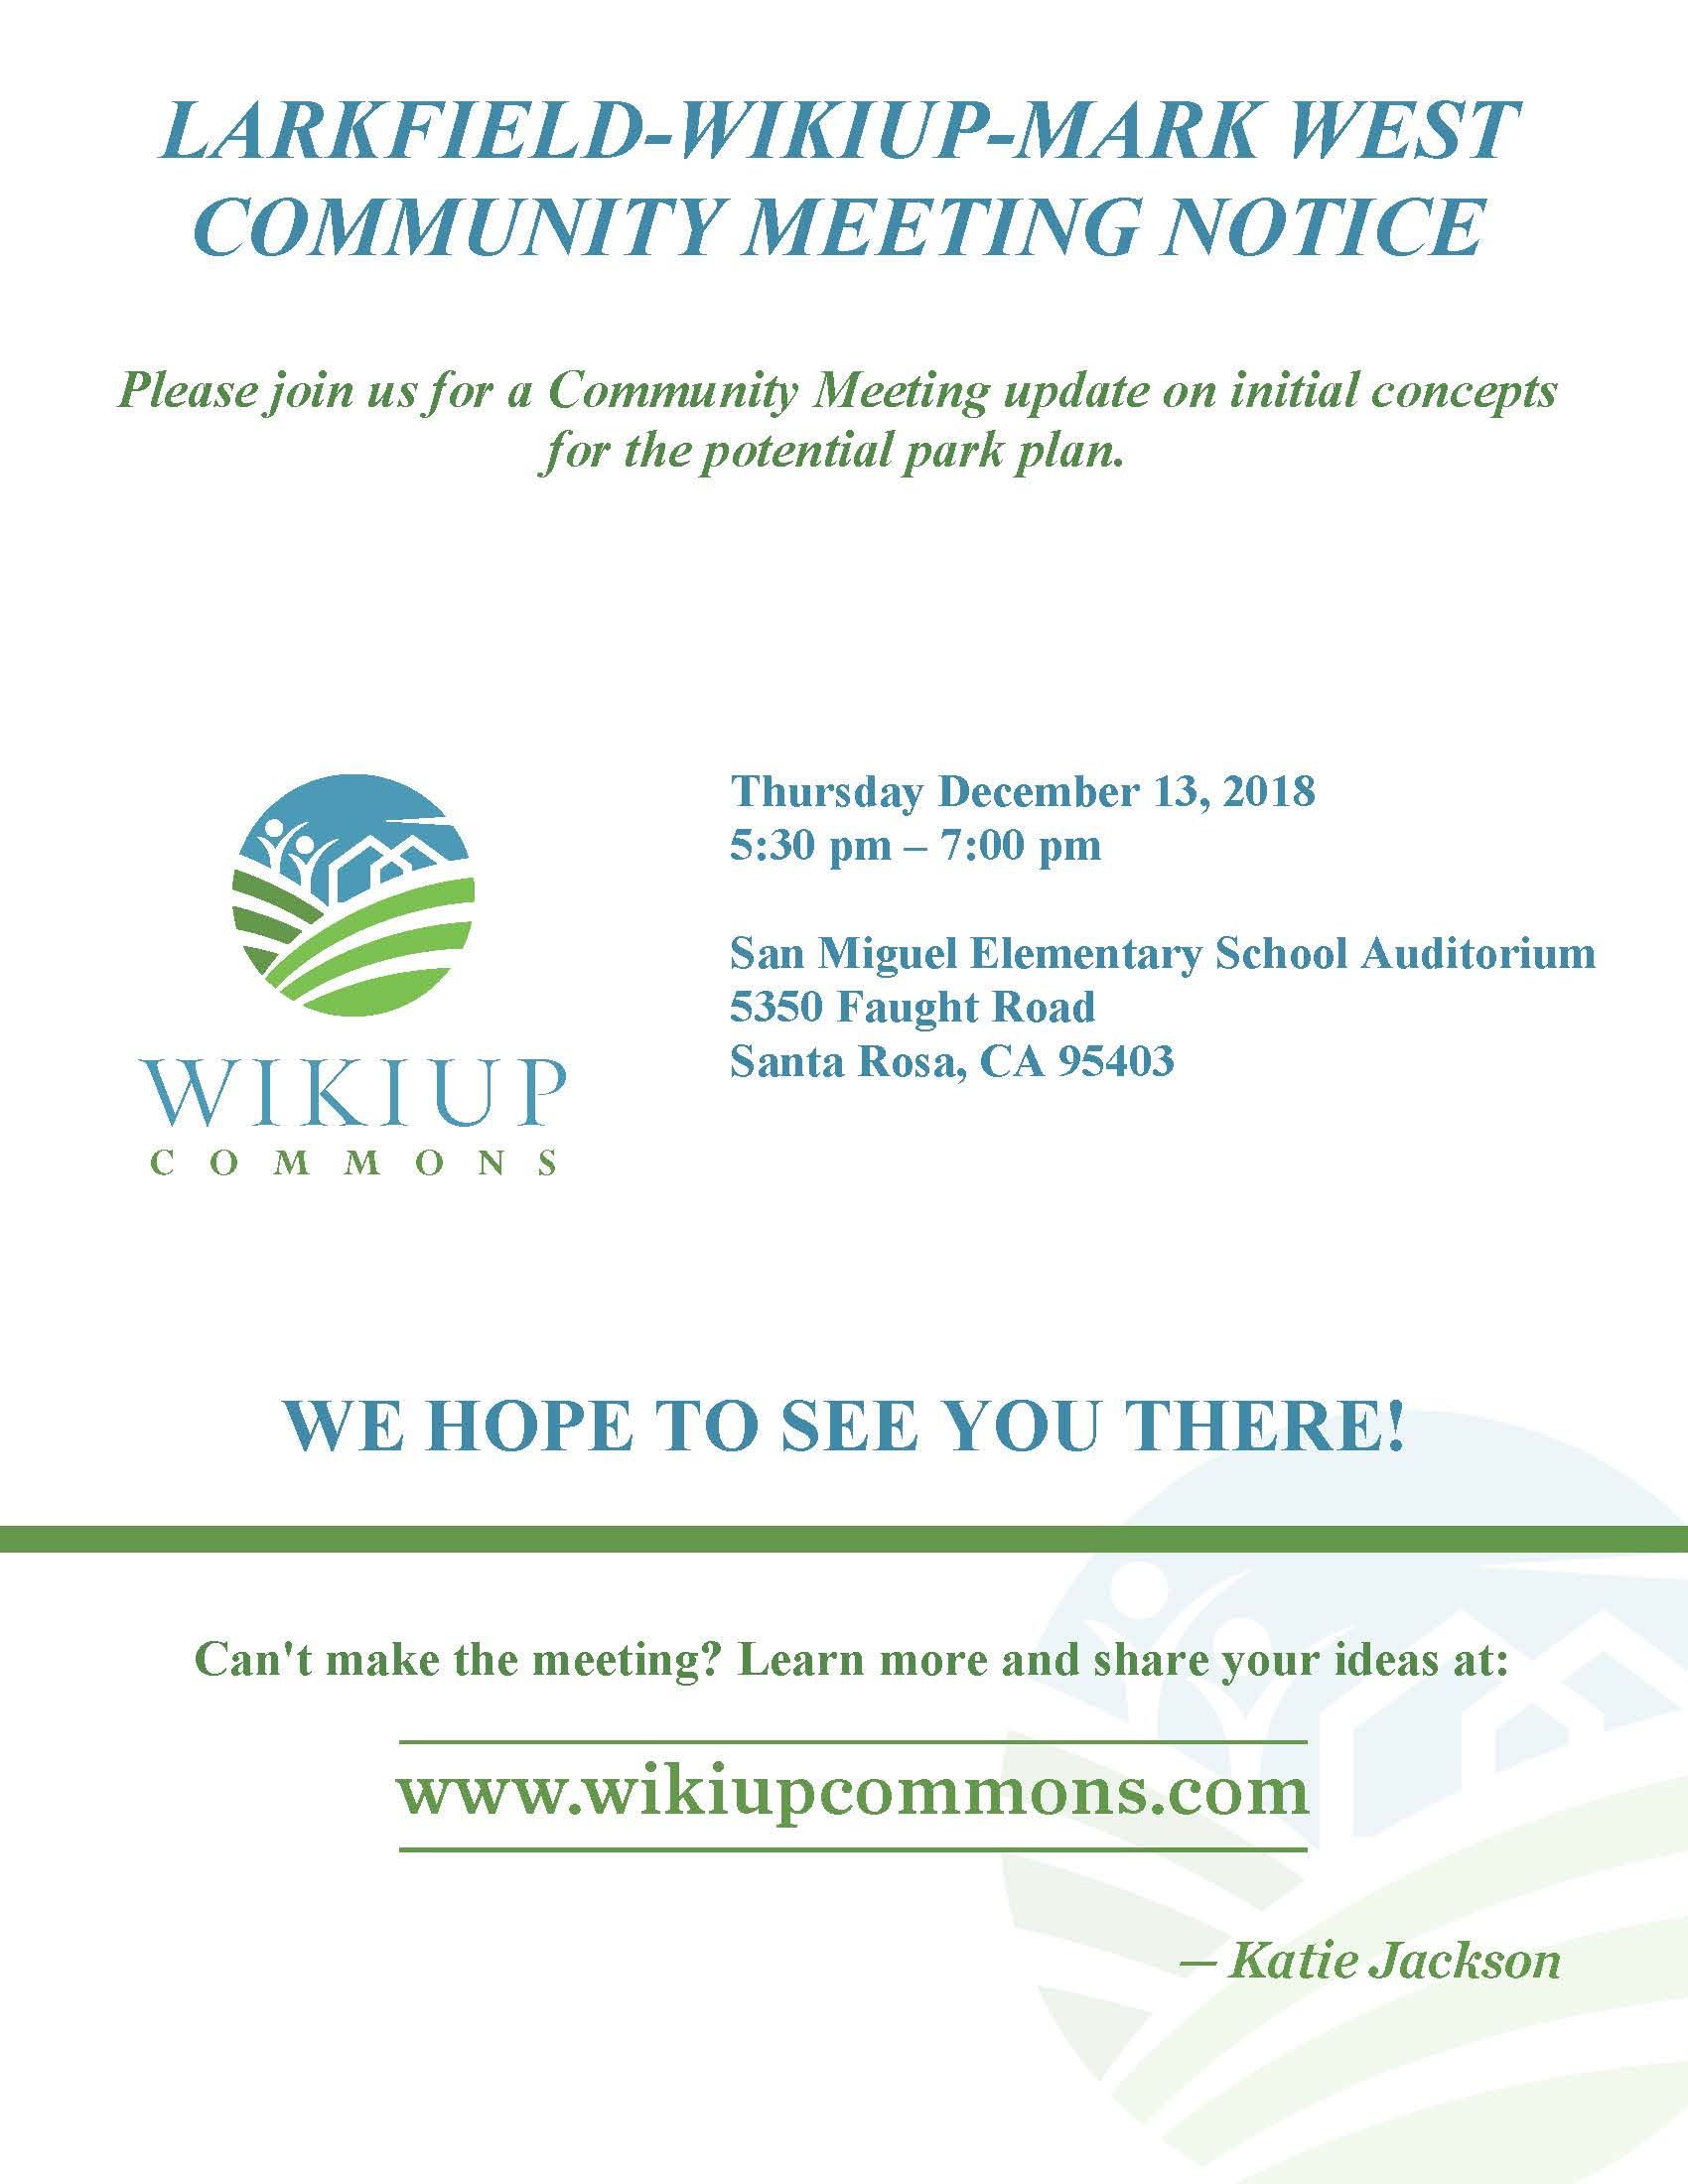 Wikiup Commons Flyer for 12.13.18.jpg